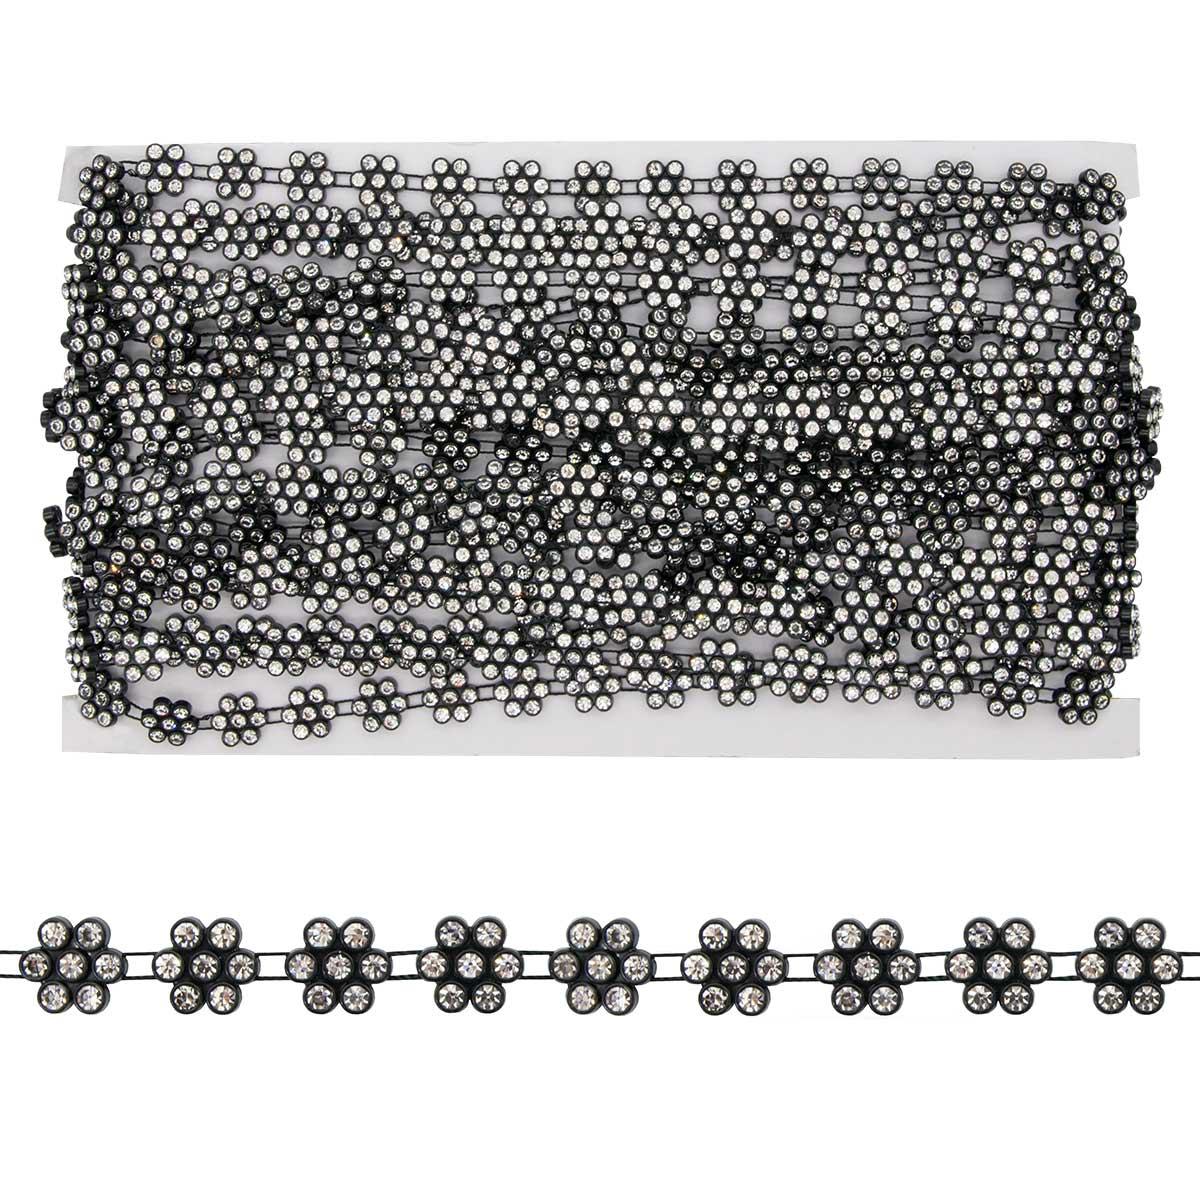 Тесьма со стразами PR03 10мм*9,14м